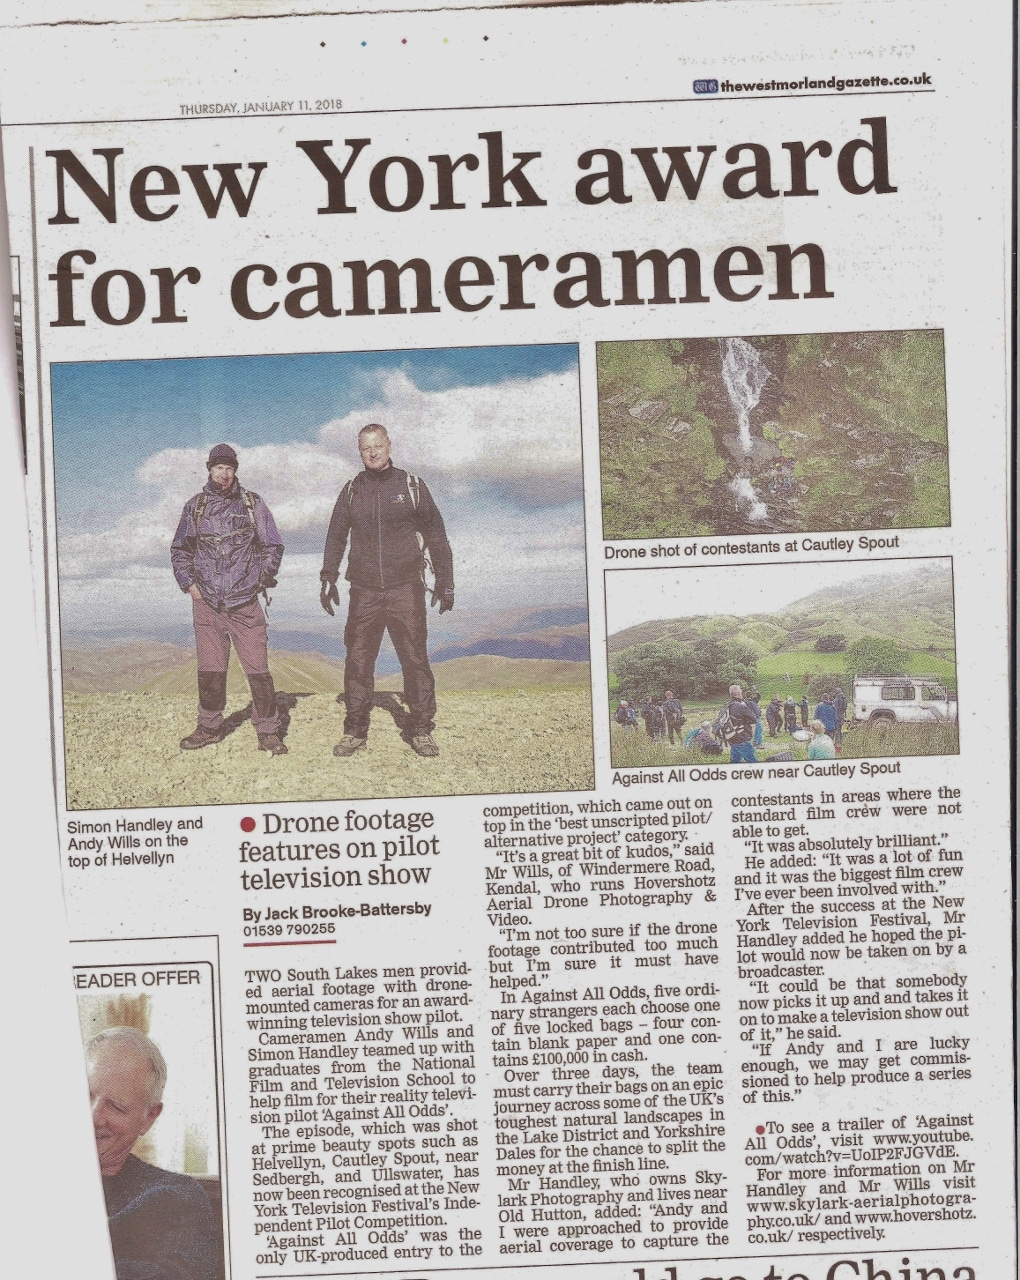 New York Award For Cameramen